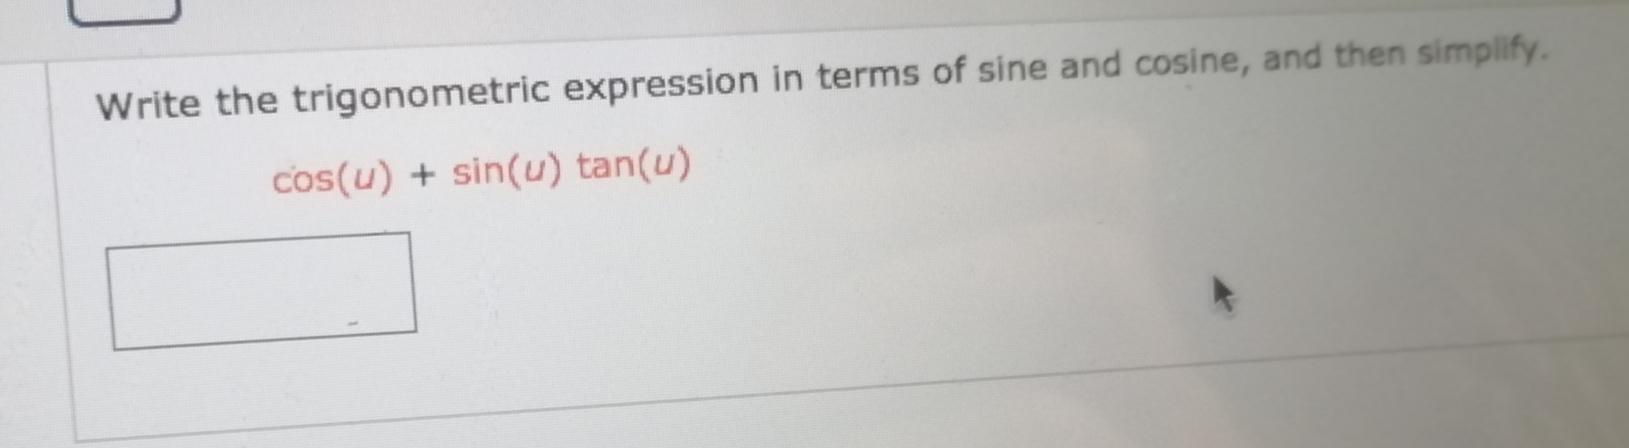 Write the trigonometric expression in terms of sine and cosine, and then simplify. cos(u) + sin(u) tan(u)